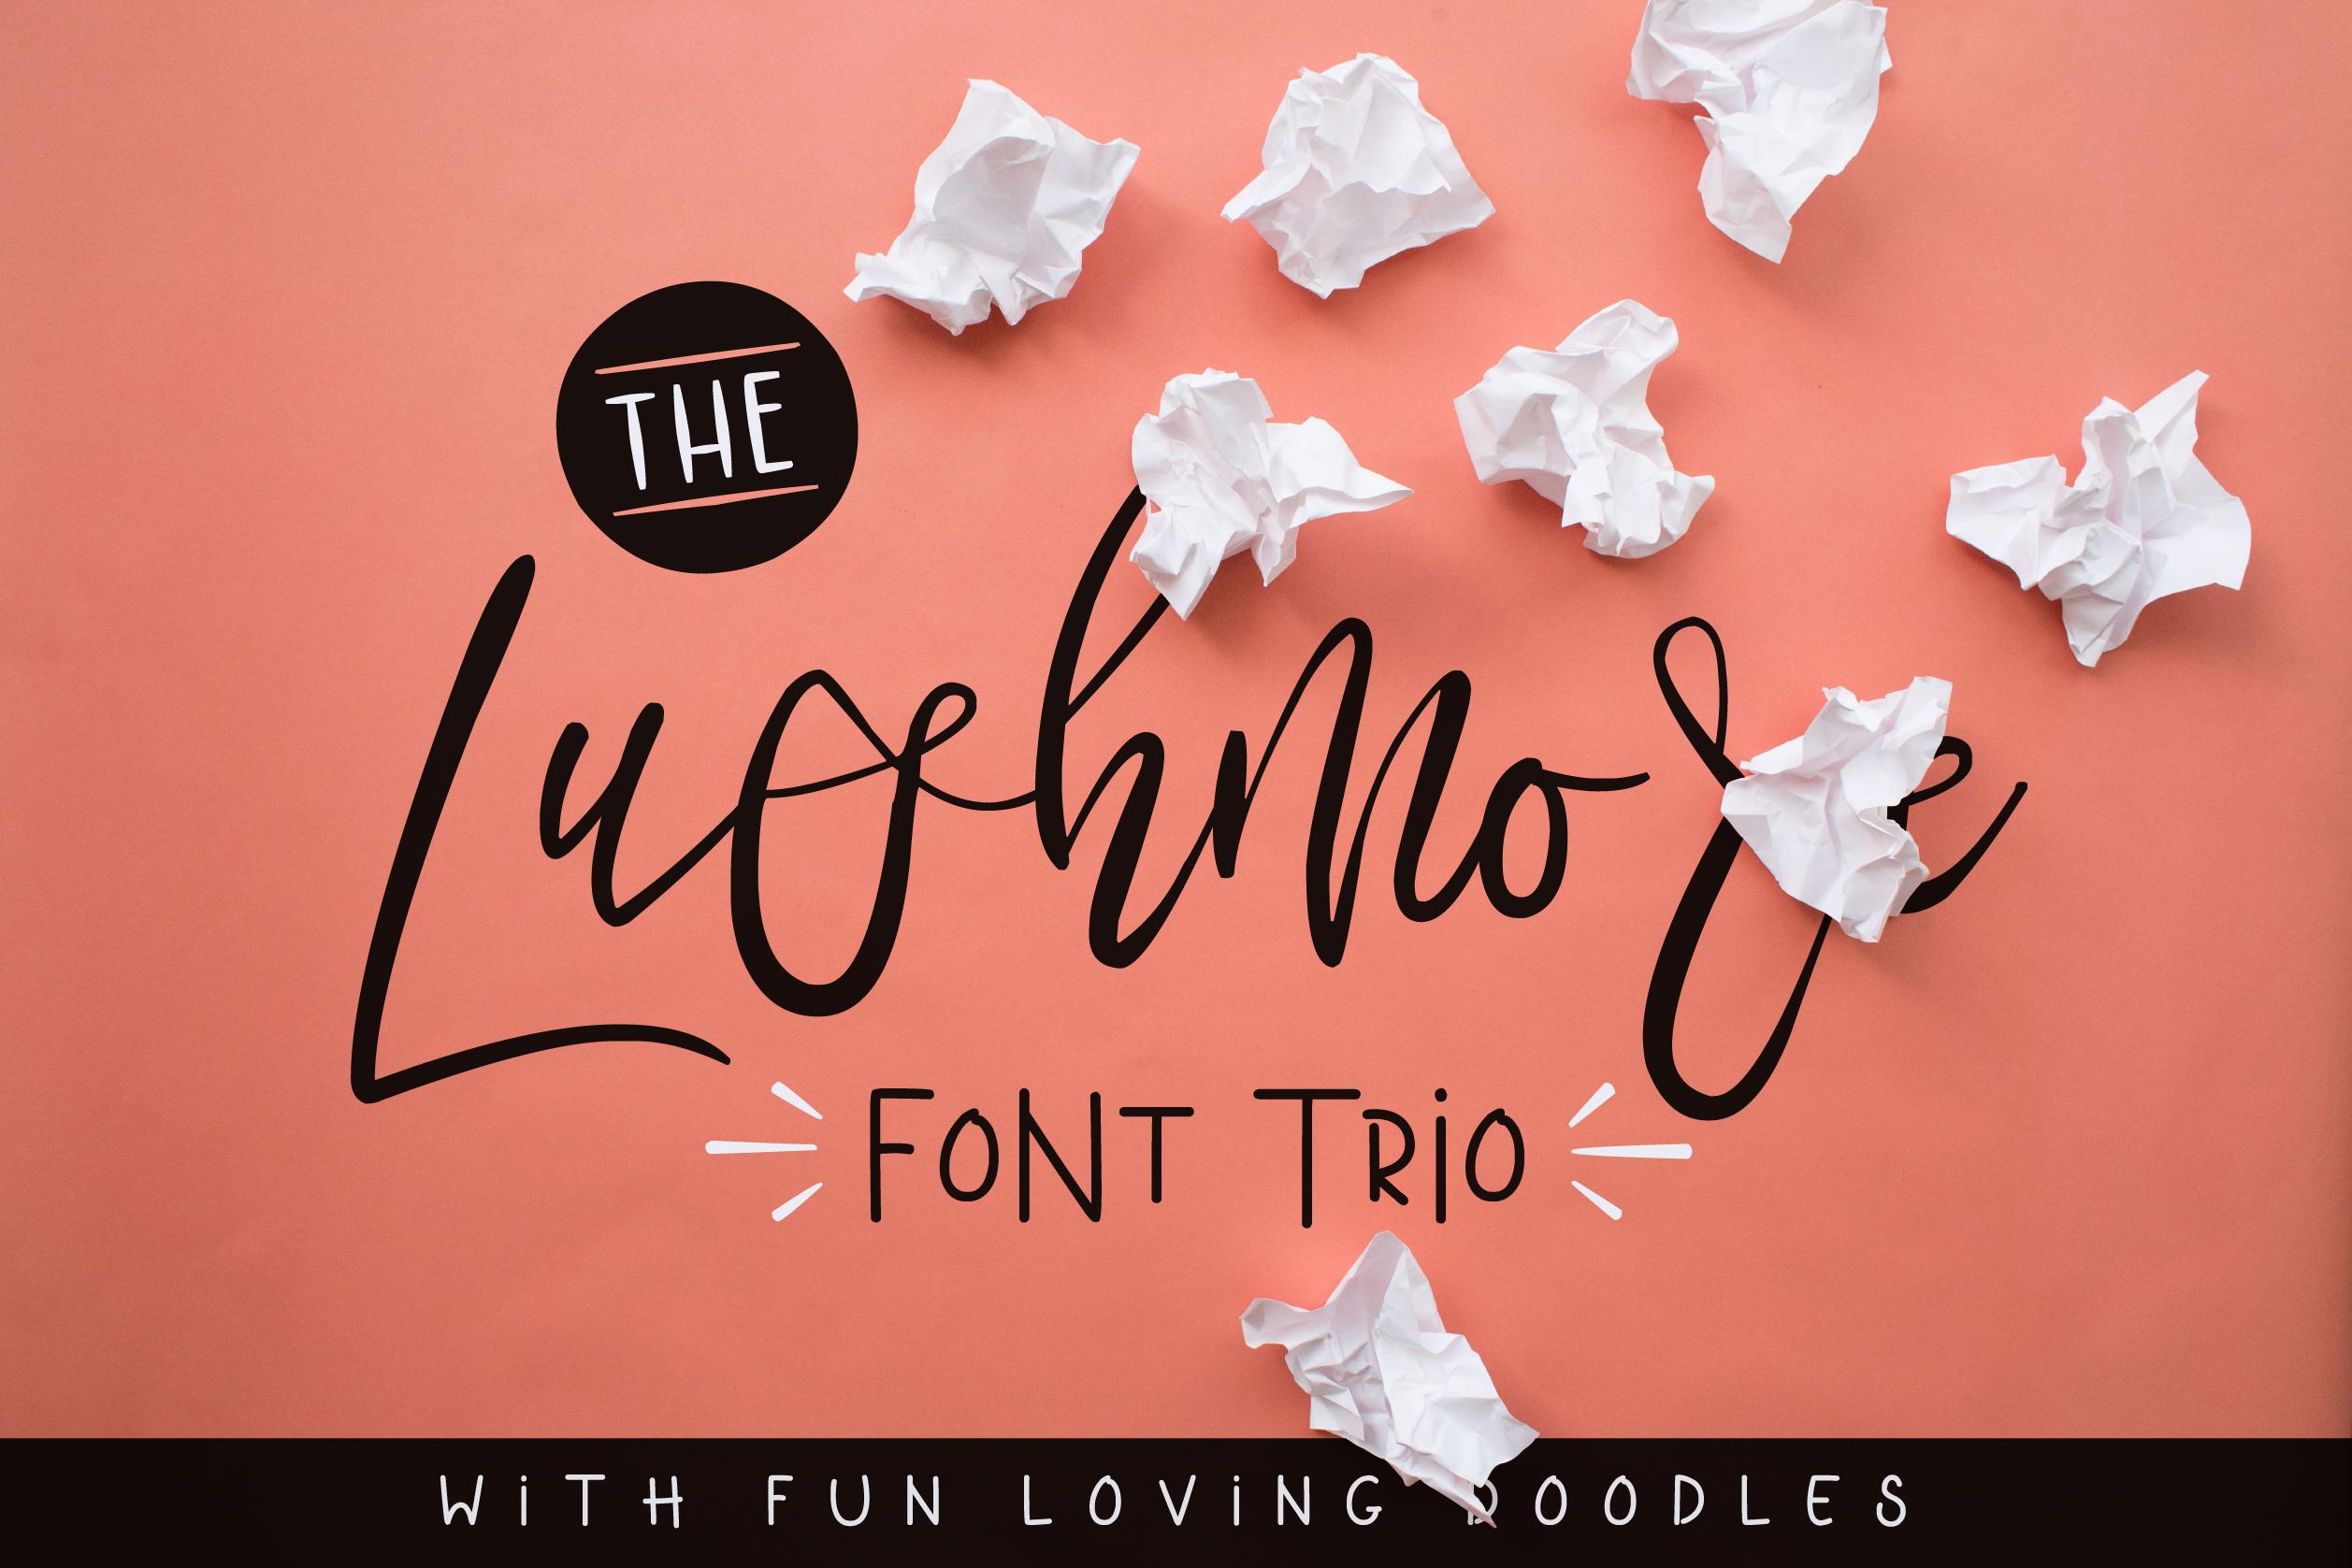 Lushmore Font Trio example image 1